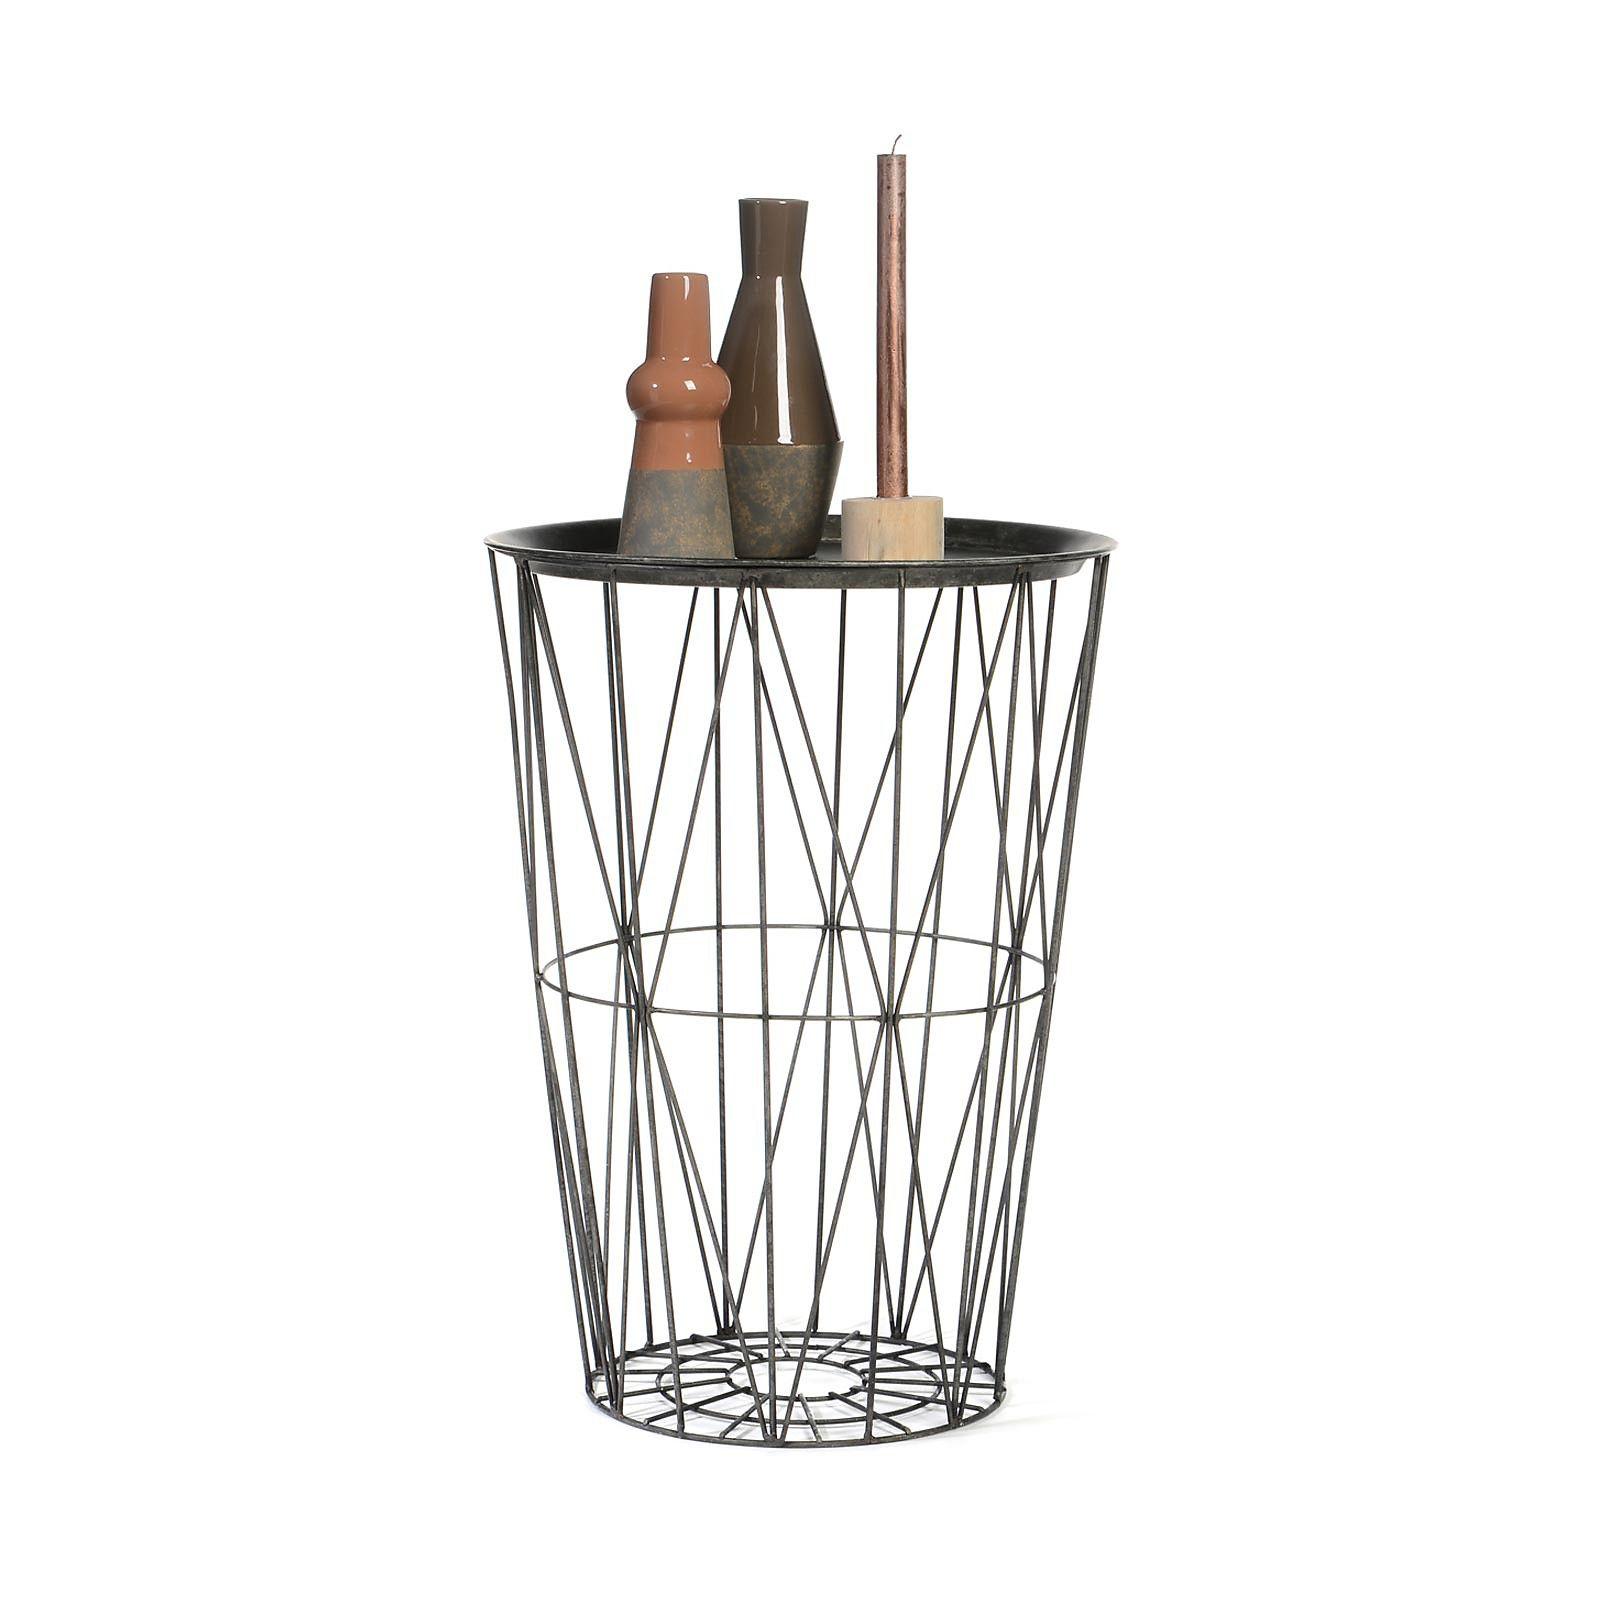 beistelltisch metall grau ca d 45 x h 60 cm living in 2018 pinterest tisch beistelltisch. Black Bedroom Furniture Sets. Home Design Ideas